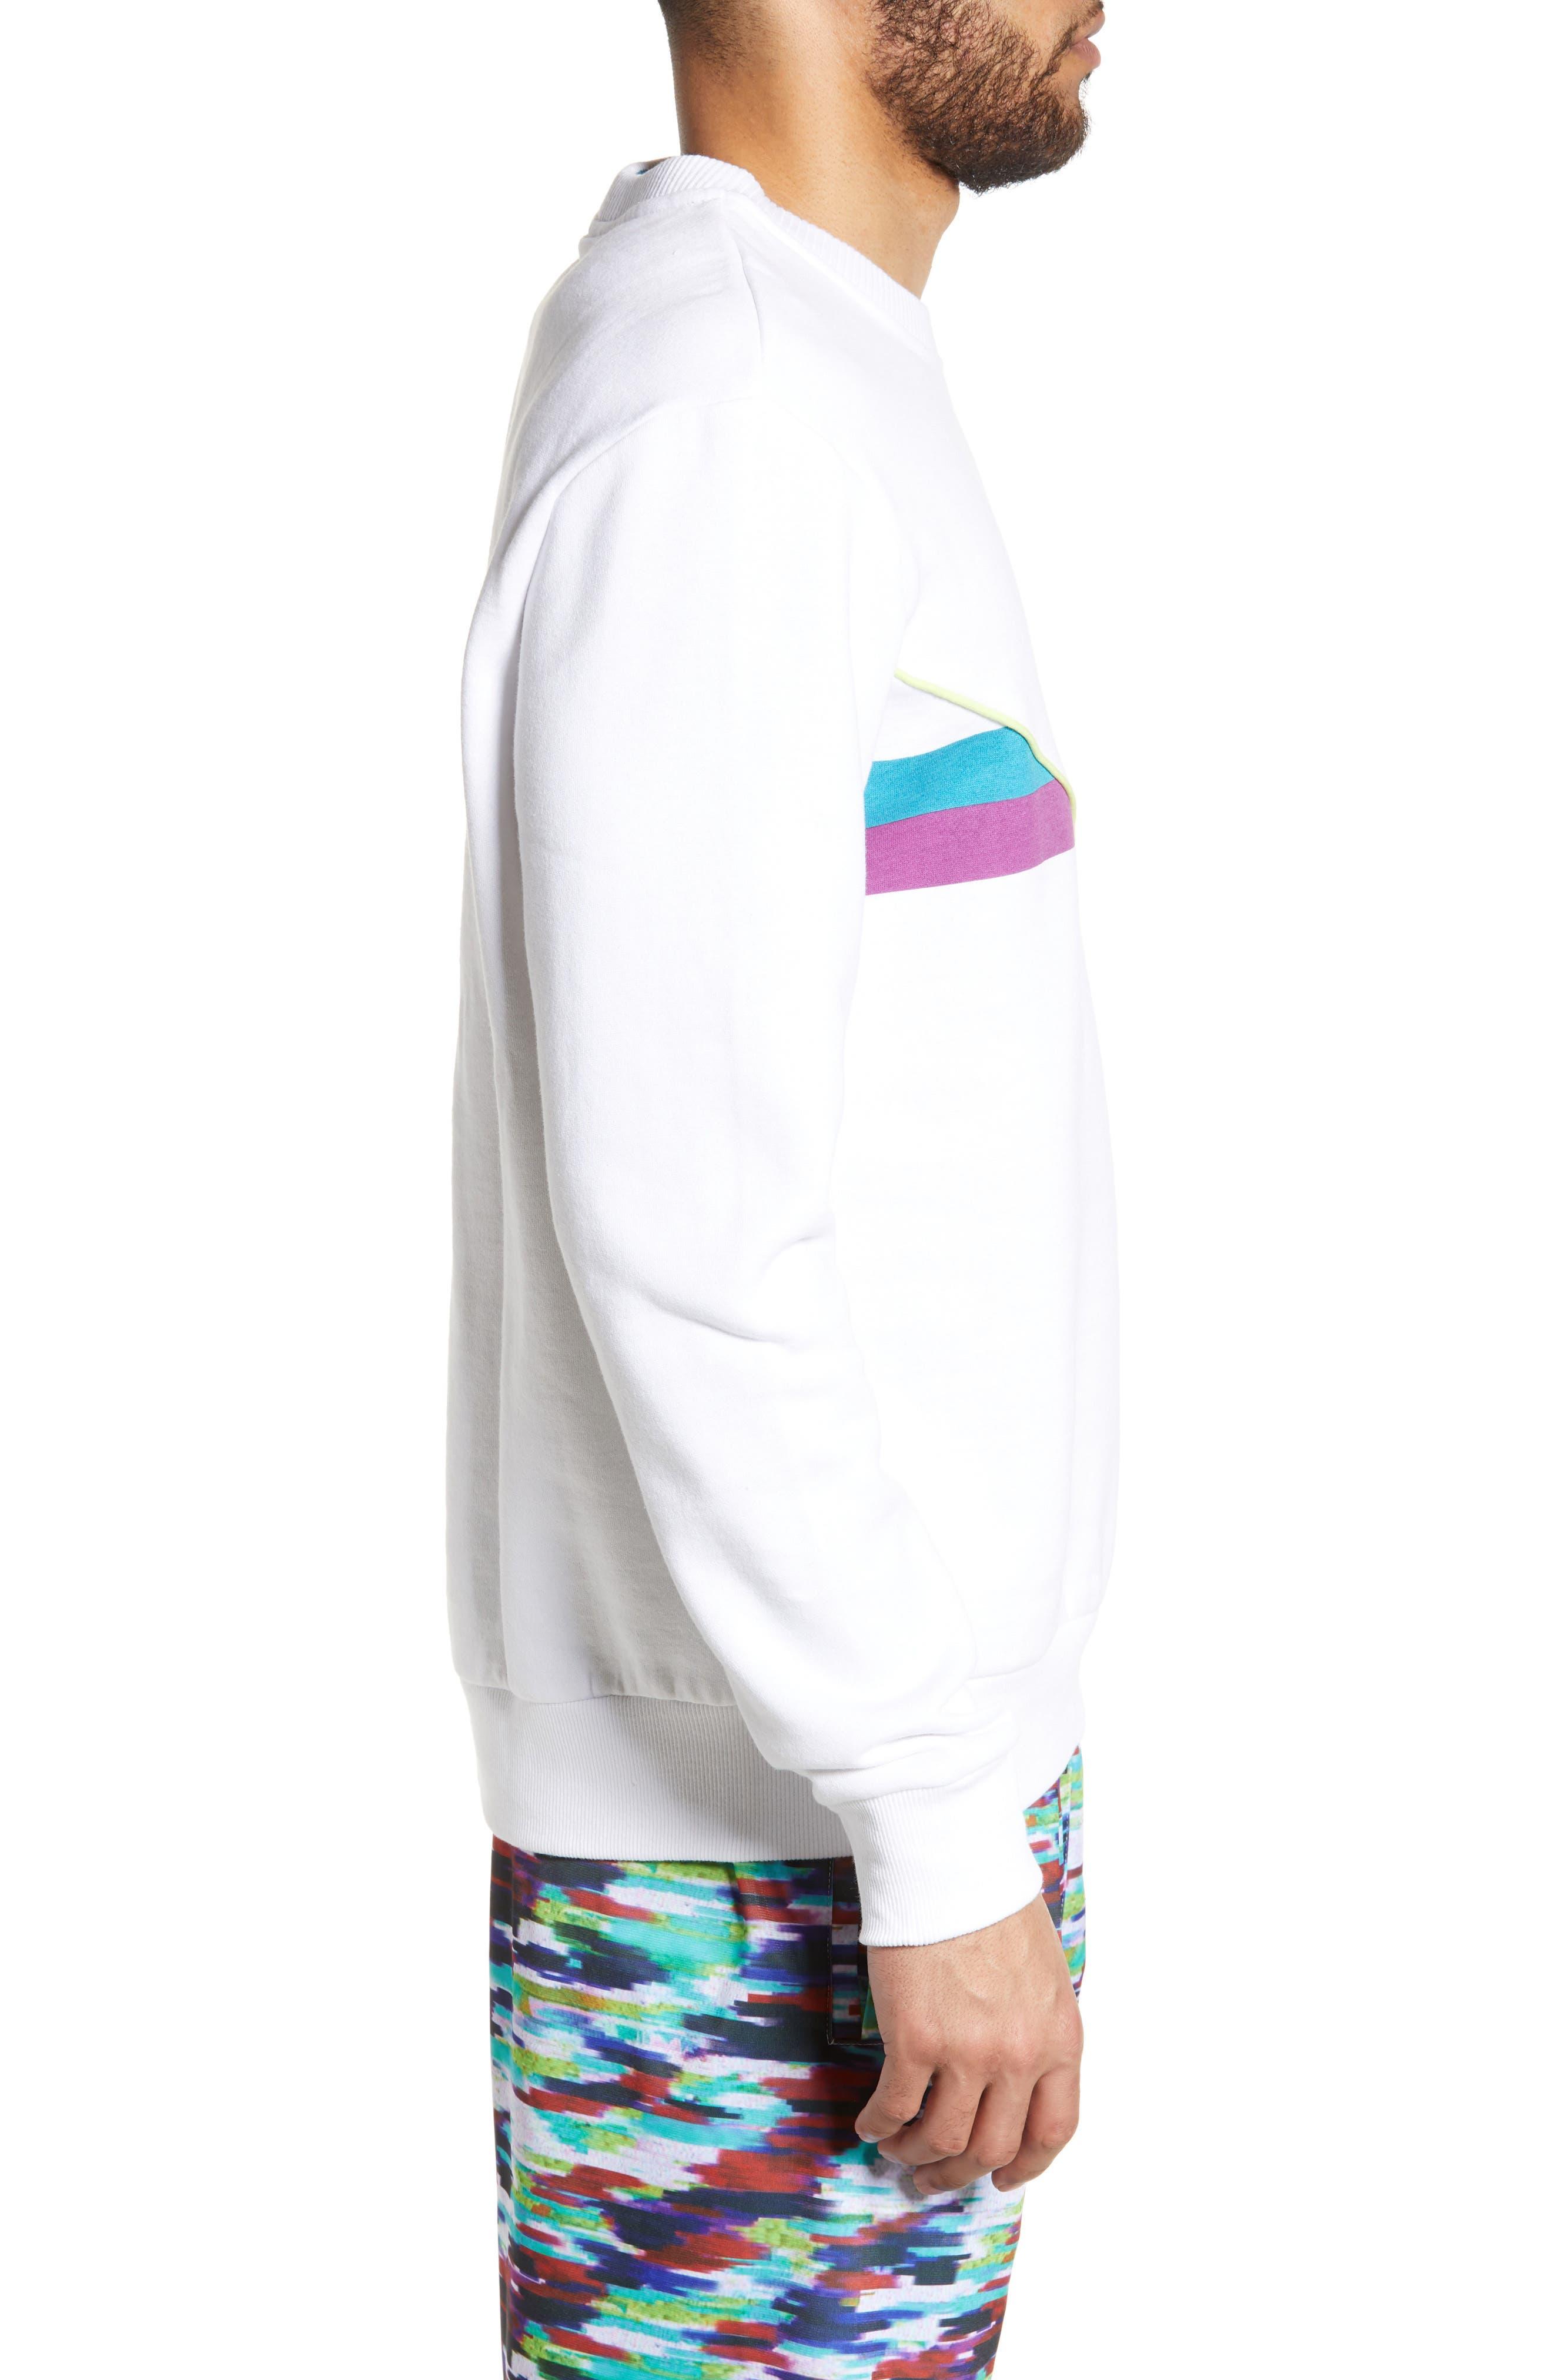 FILA, Leroy Chevron Sweatshirt, Alternate thumbnail 3, color, WHITE